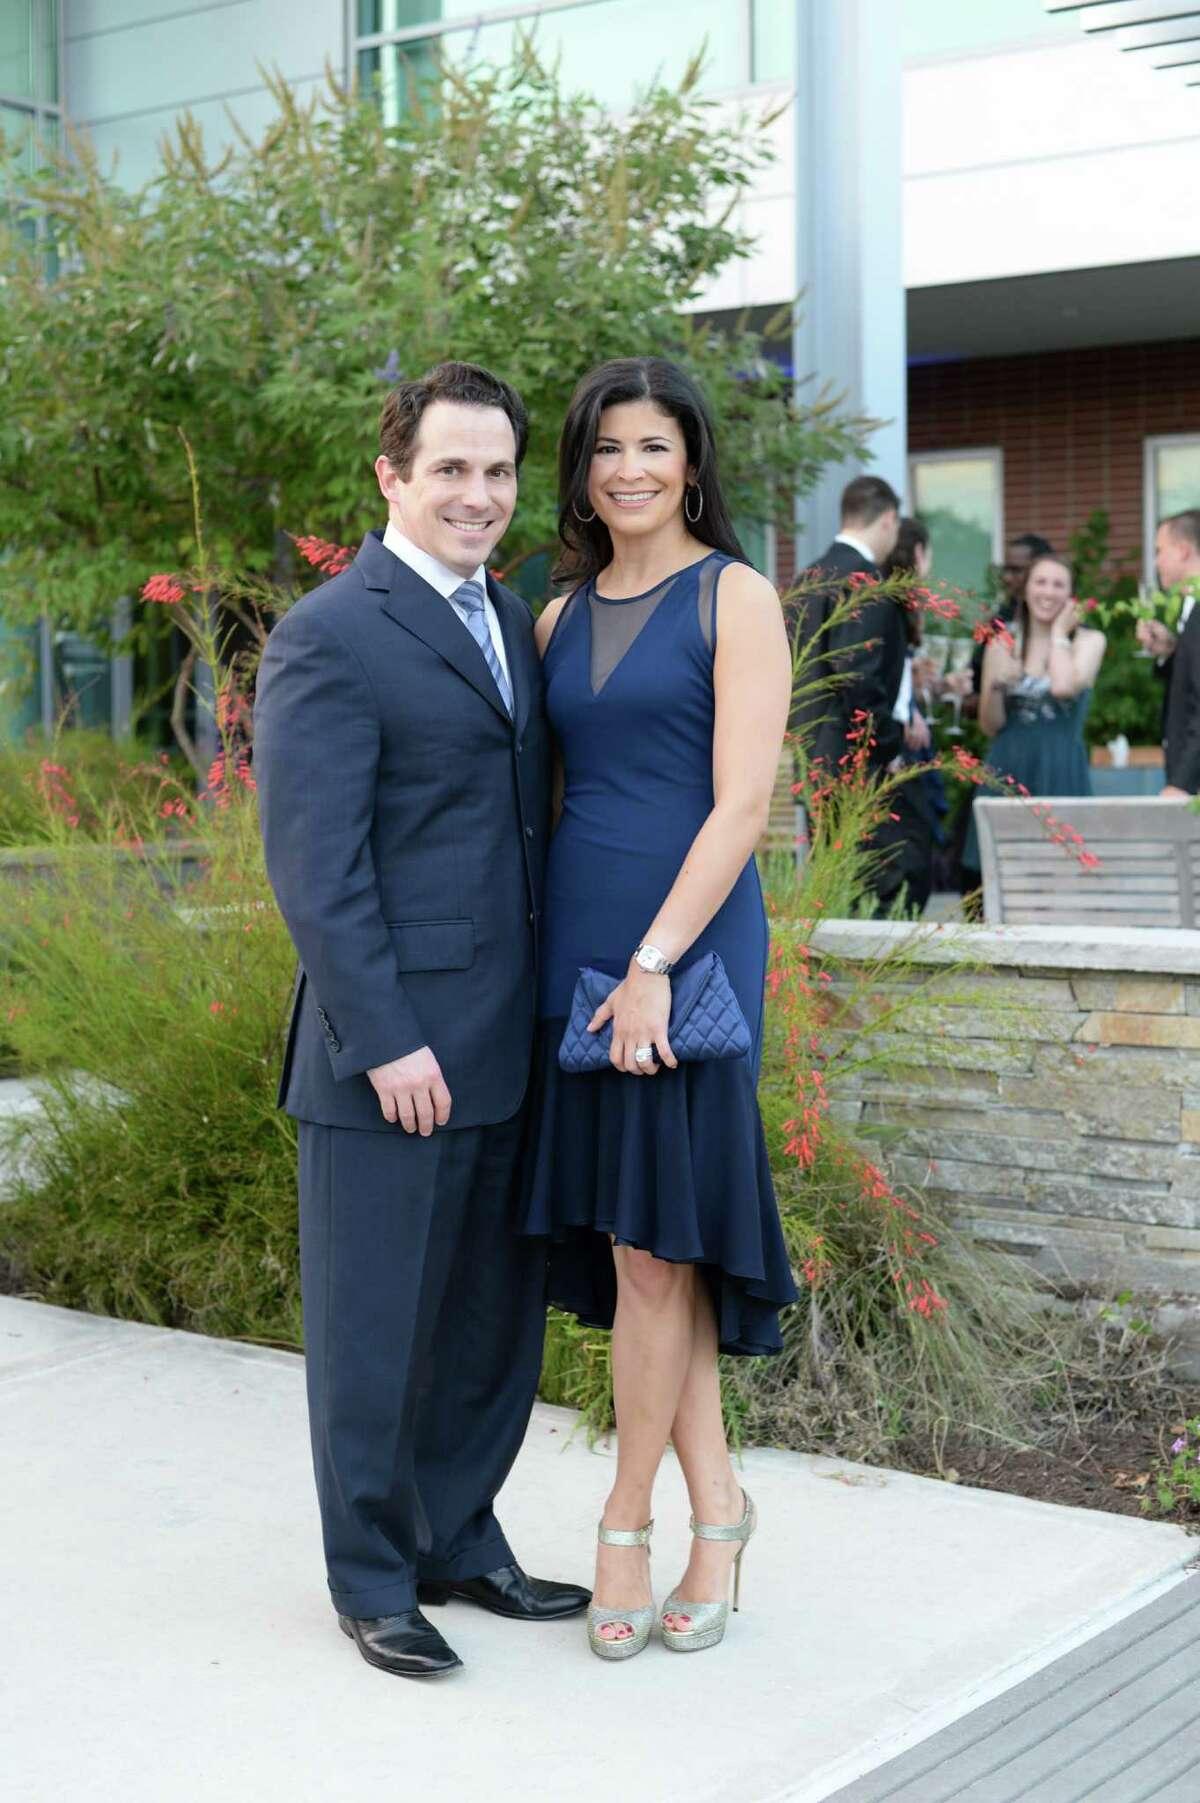 Chris and Kristy Bradshaw